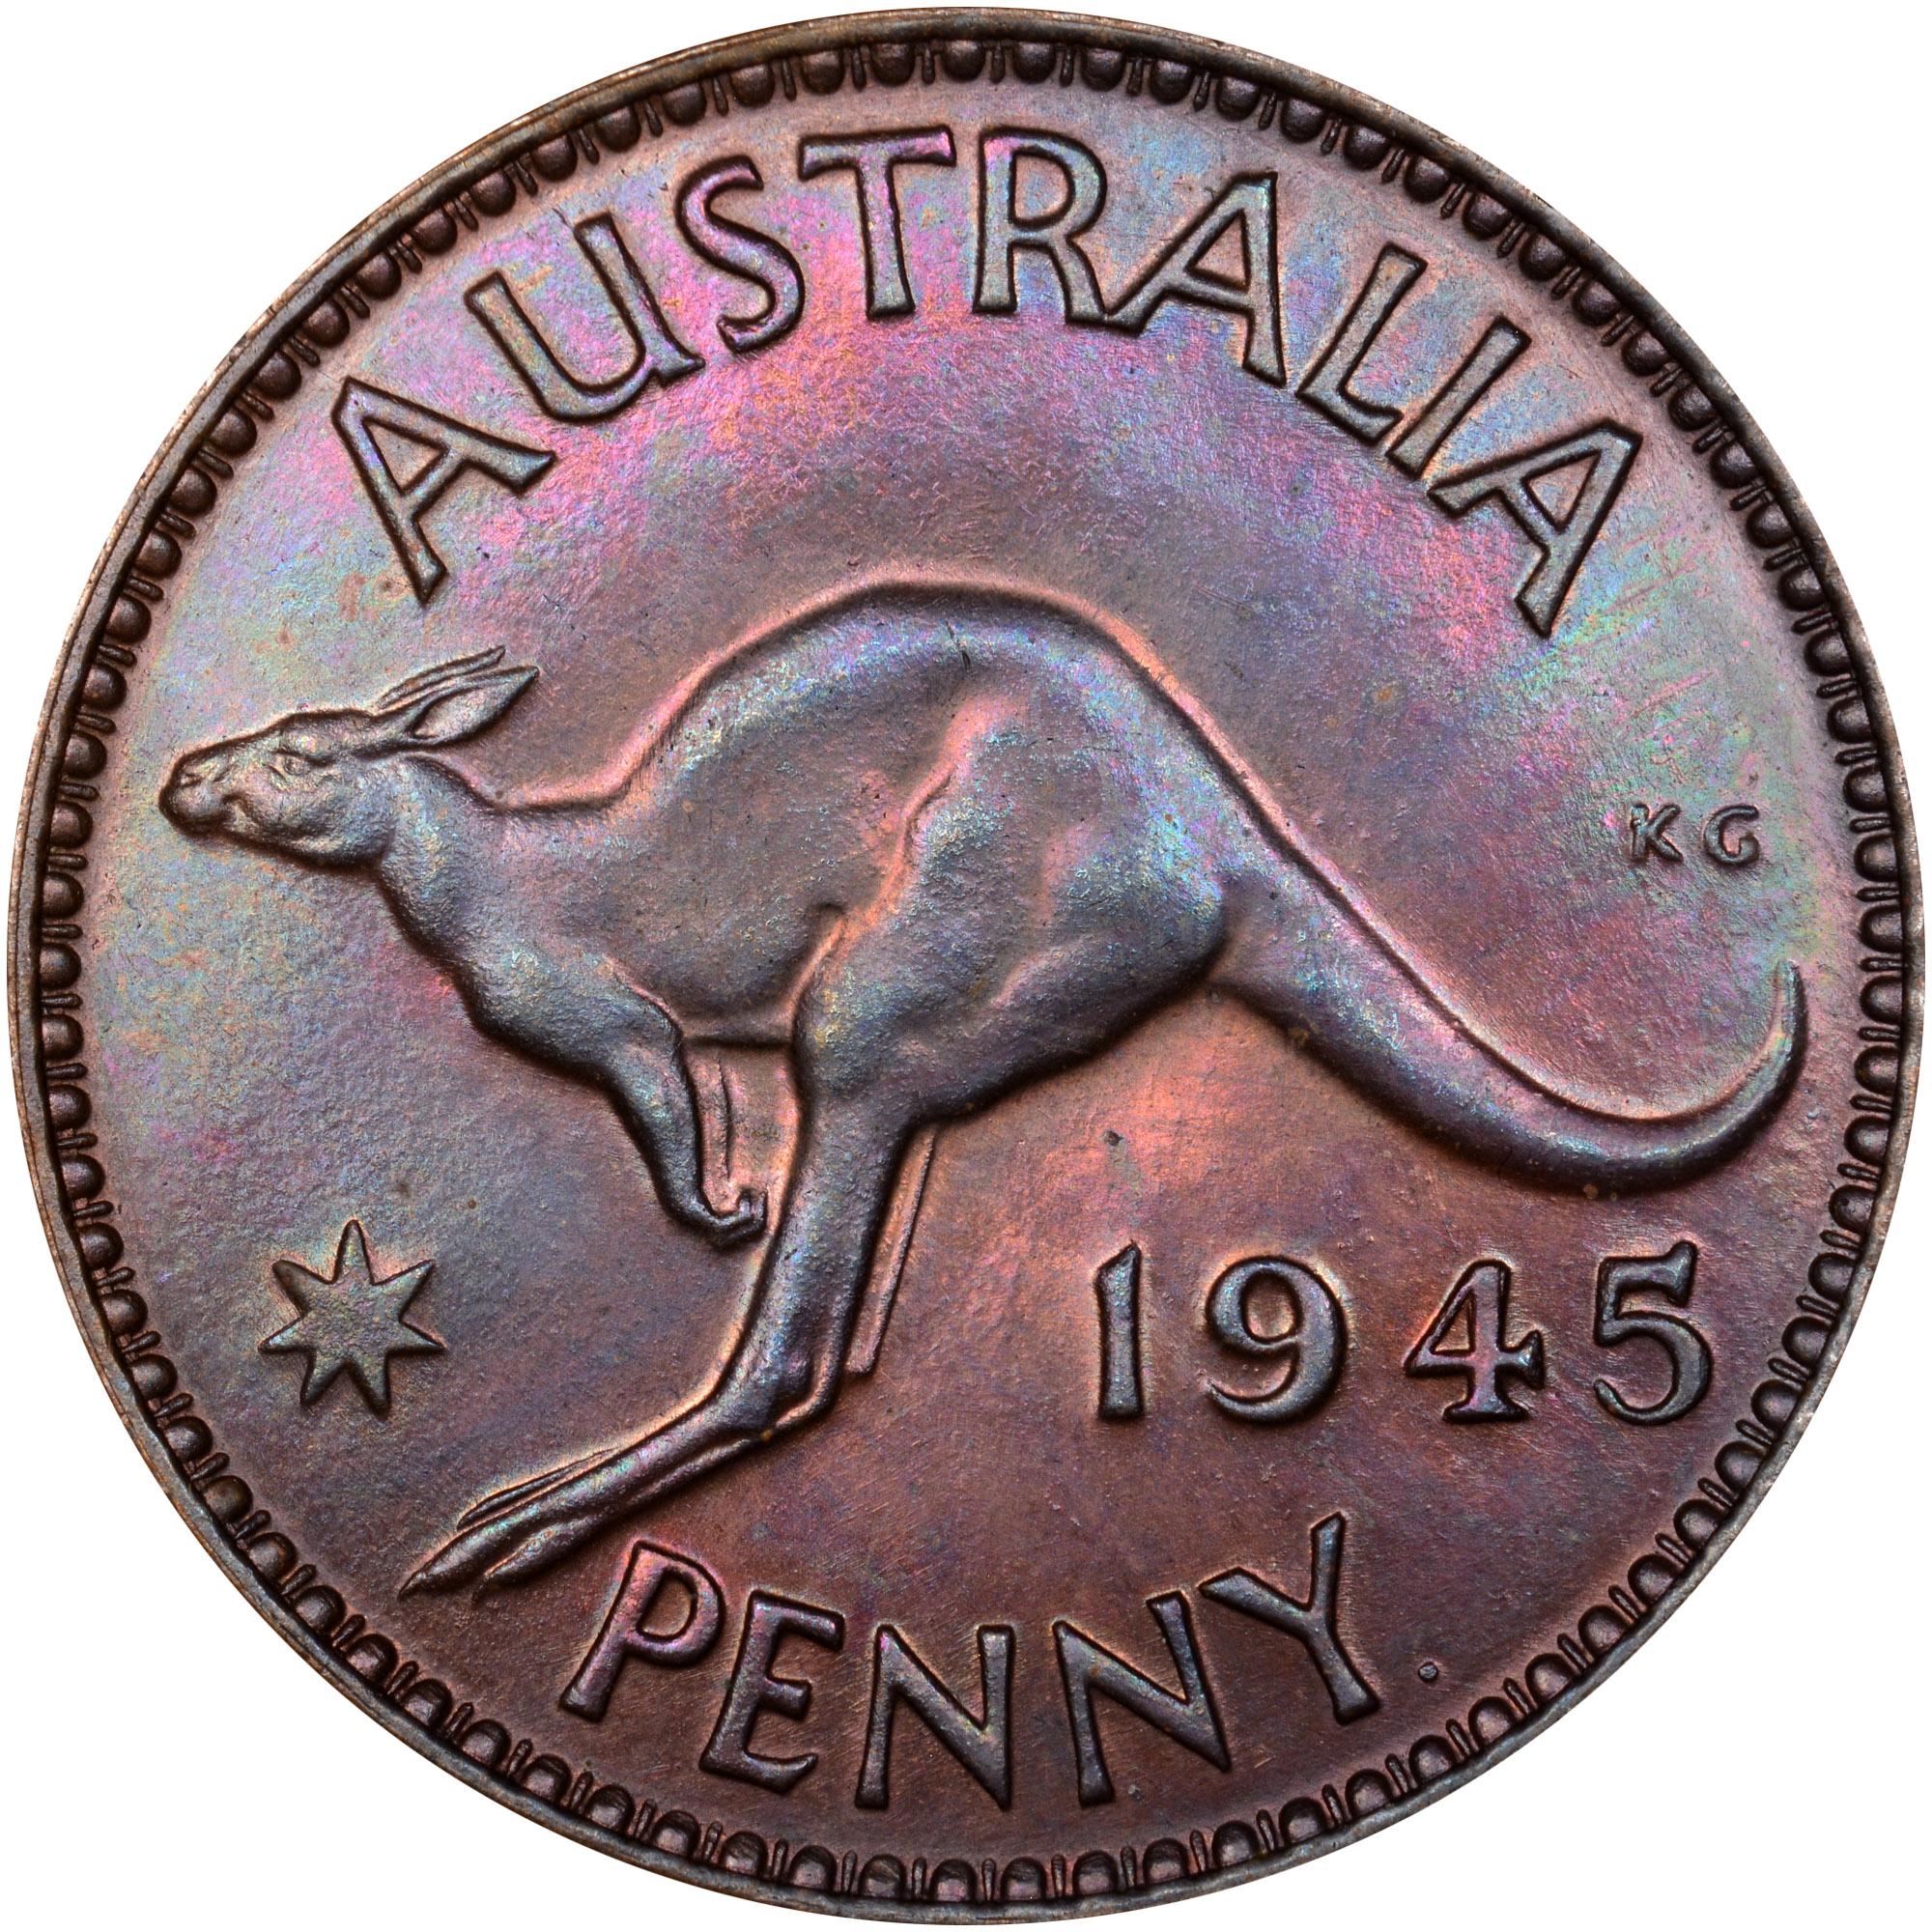 1938-1948 Australia Penny reverse